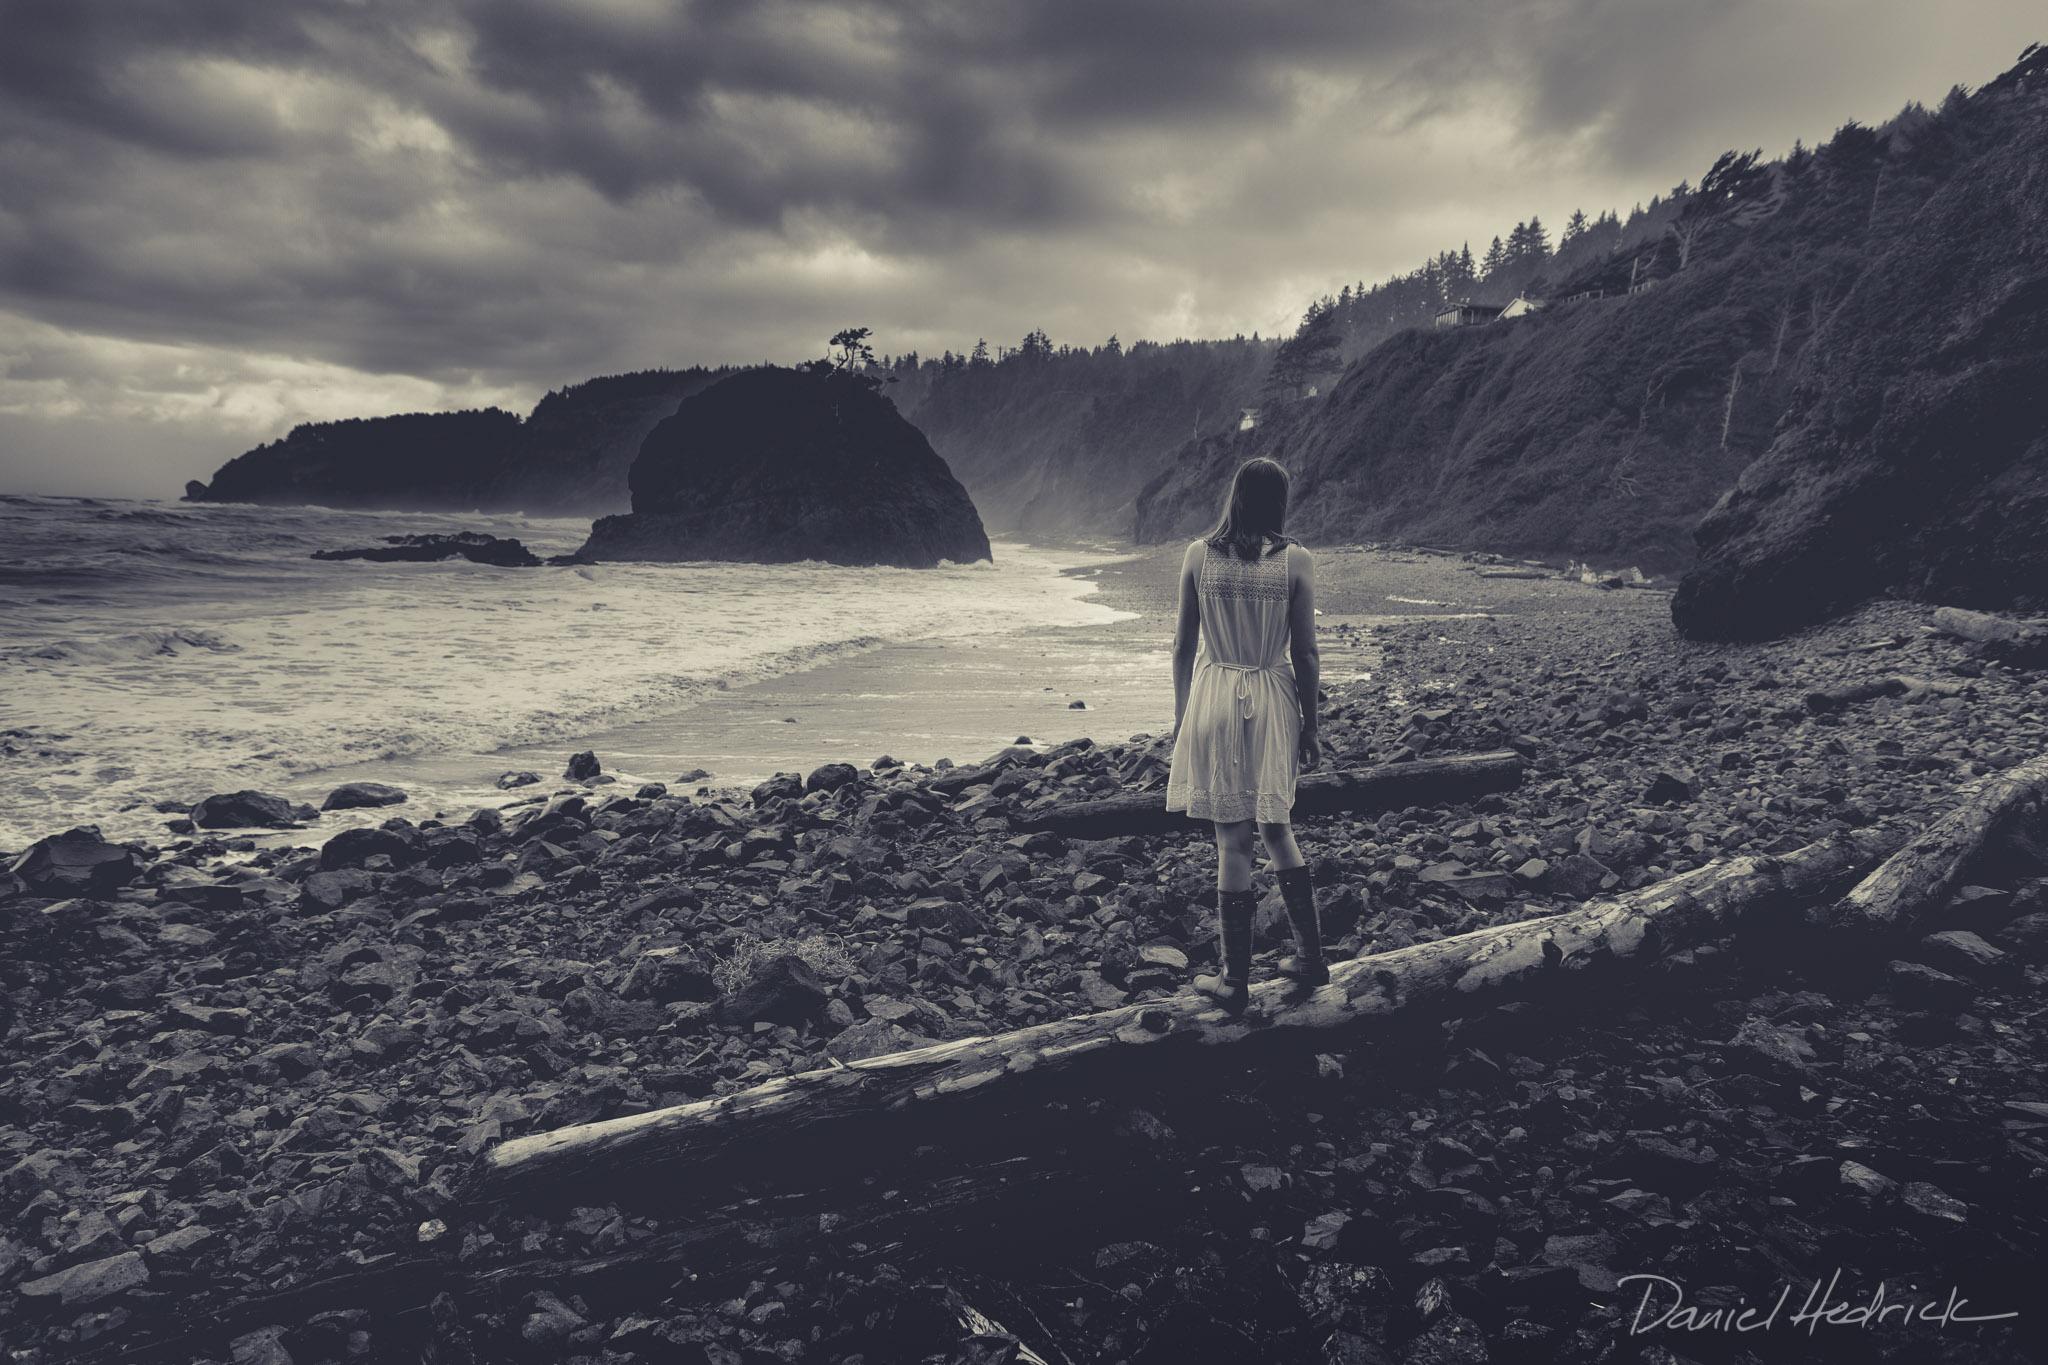 Canon EOS 5D Mk III • 1/500 • ƒ4 • 24mm • Oregon Coast